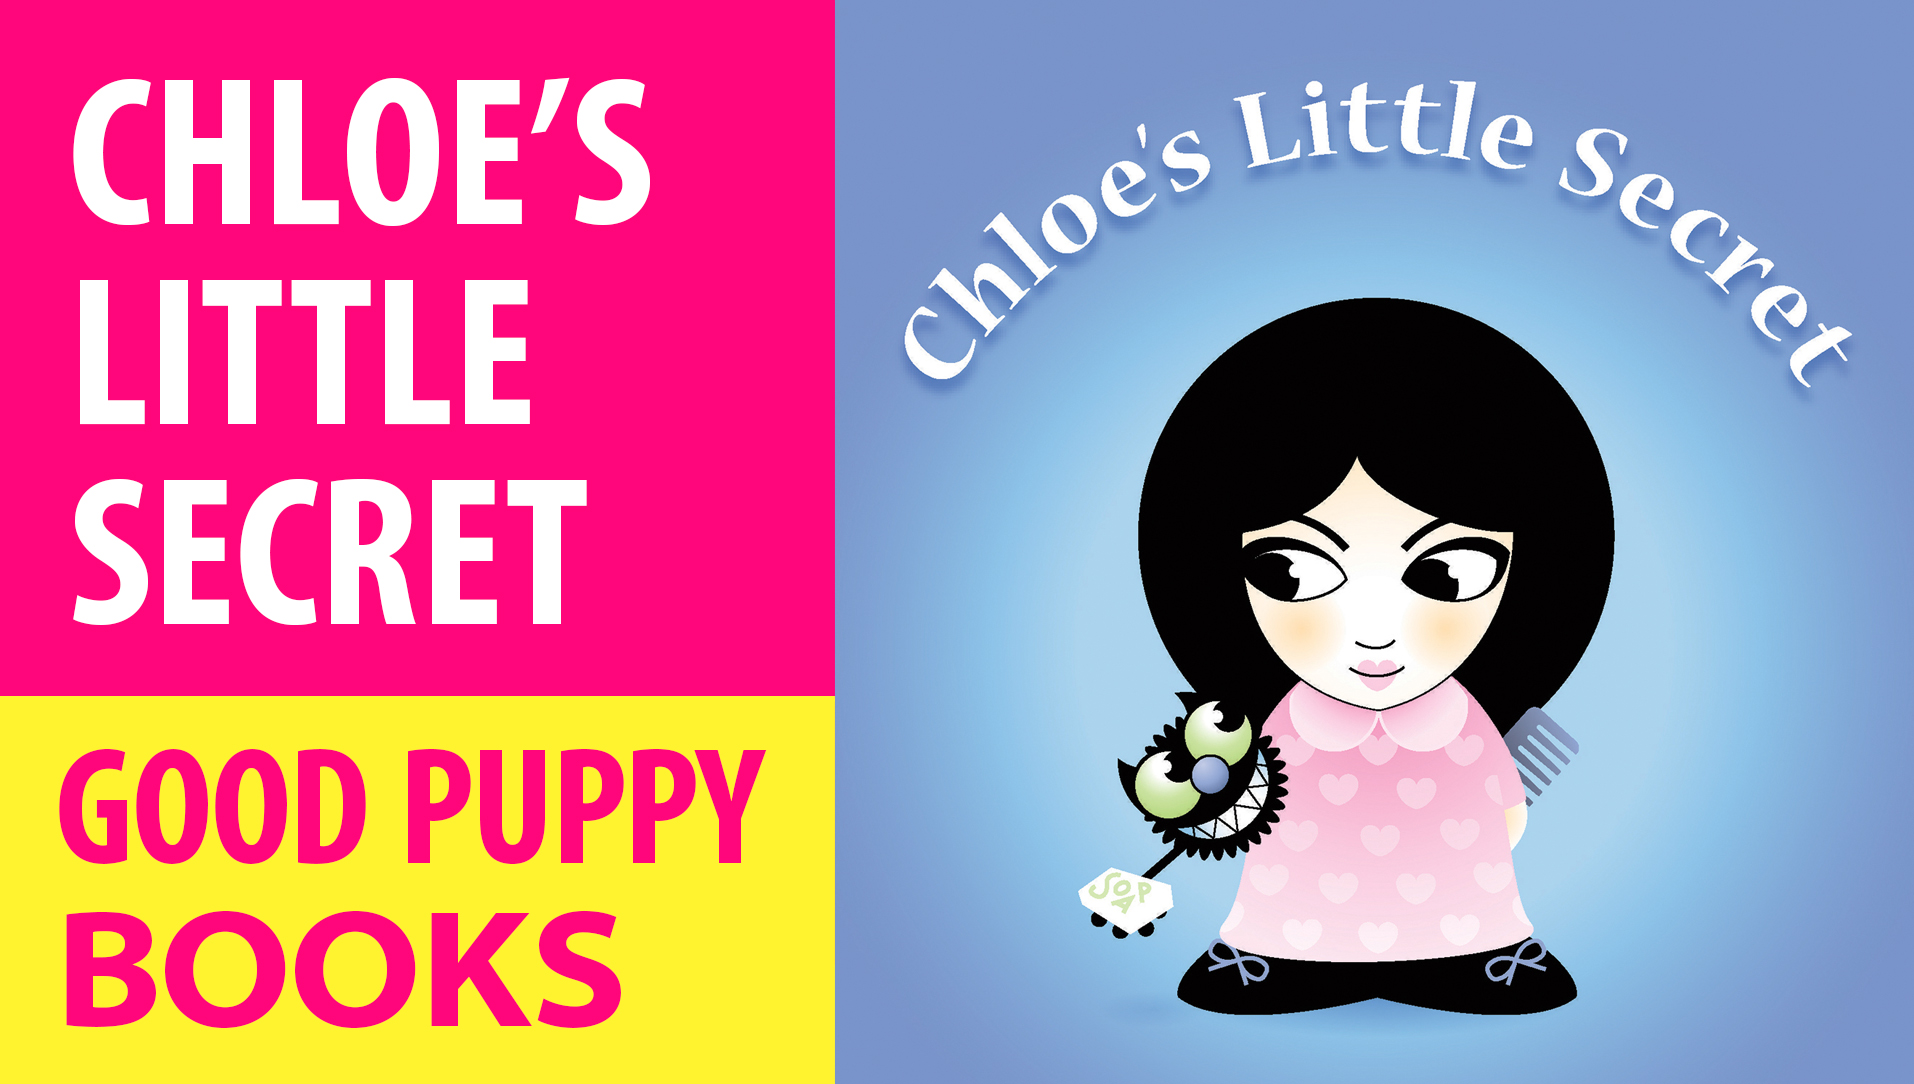 CHILDREN'S PICTURE BOOKS : Chloe's Little Secret